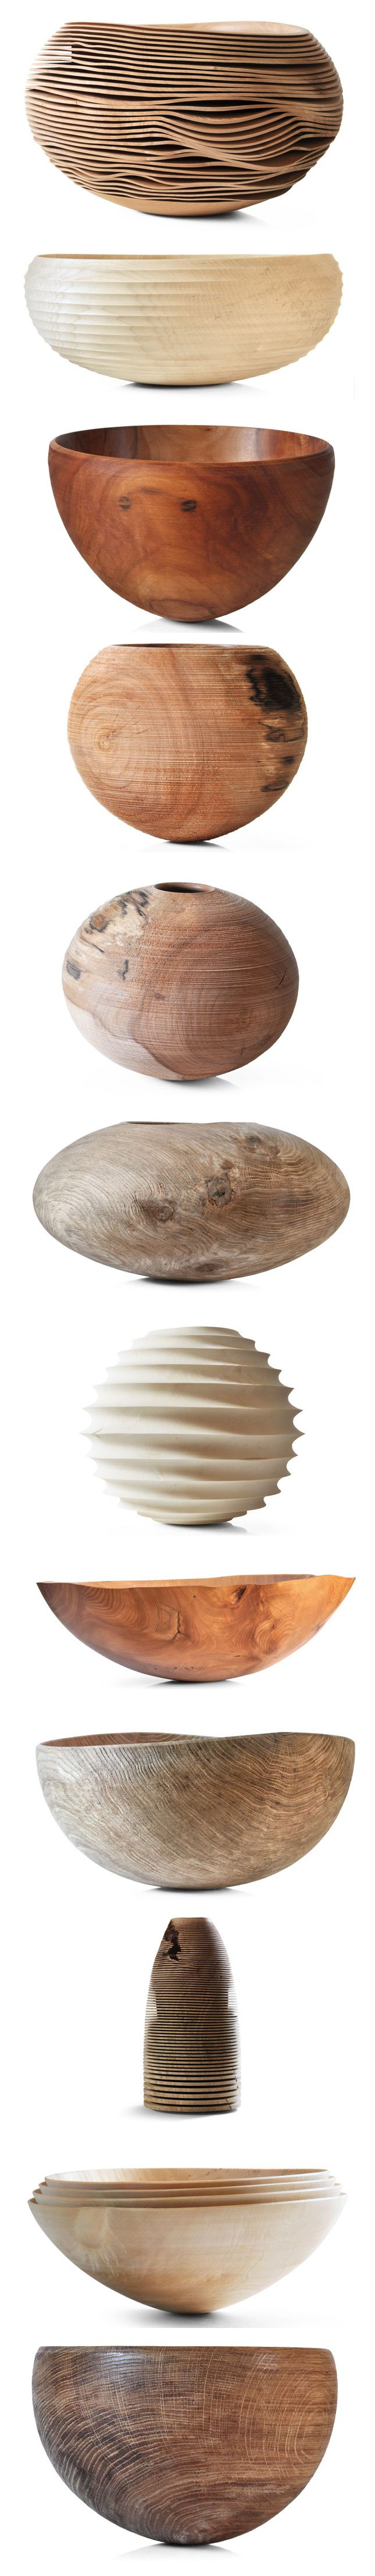 Mahadev wood industries is leading industries in #wooden branded project, We…                                                                                                                                                                                 More